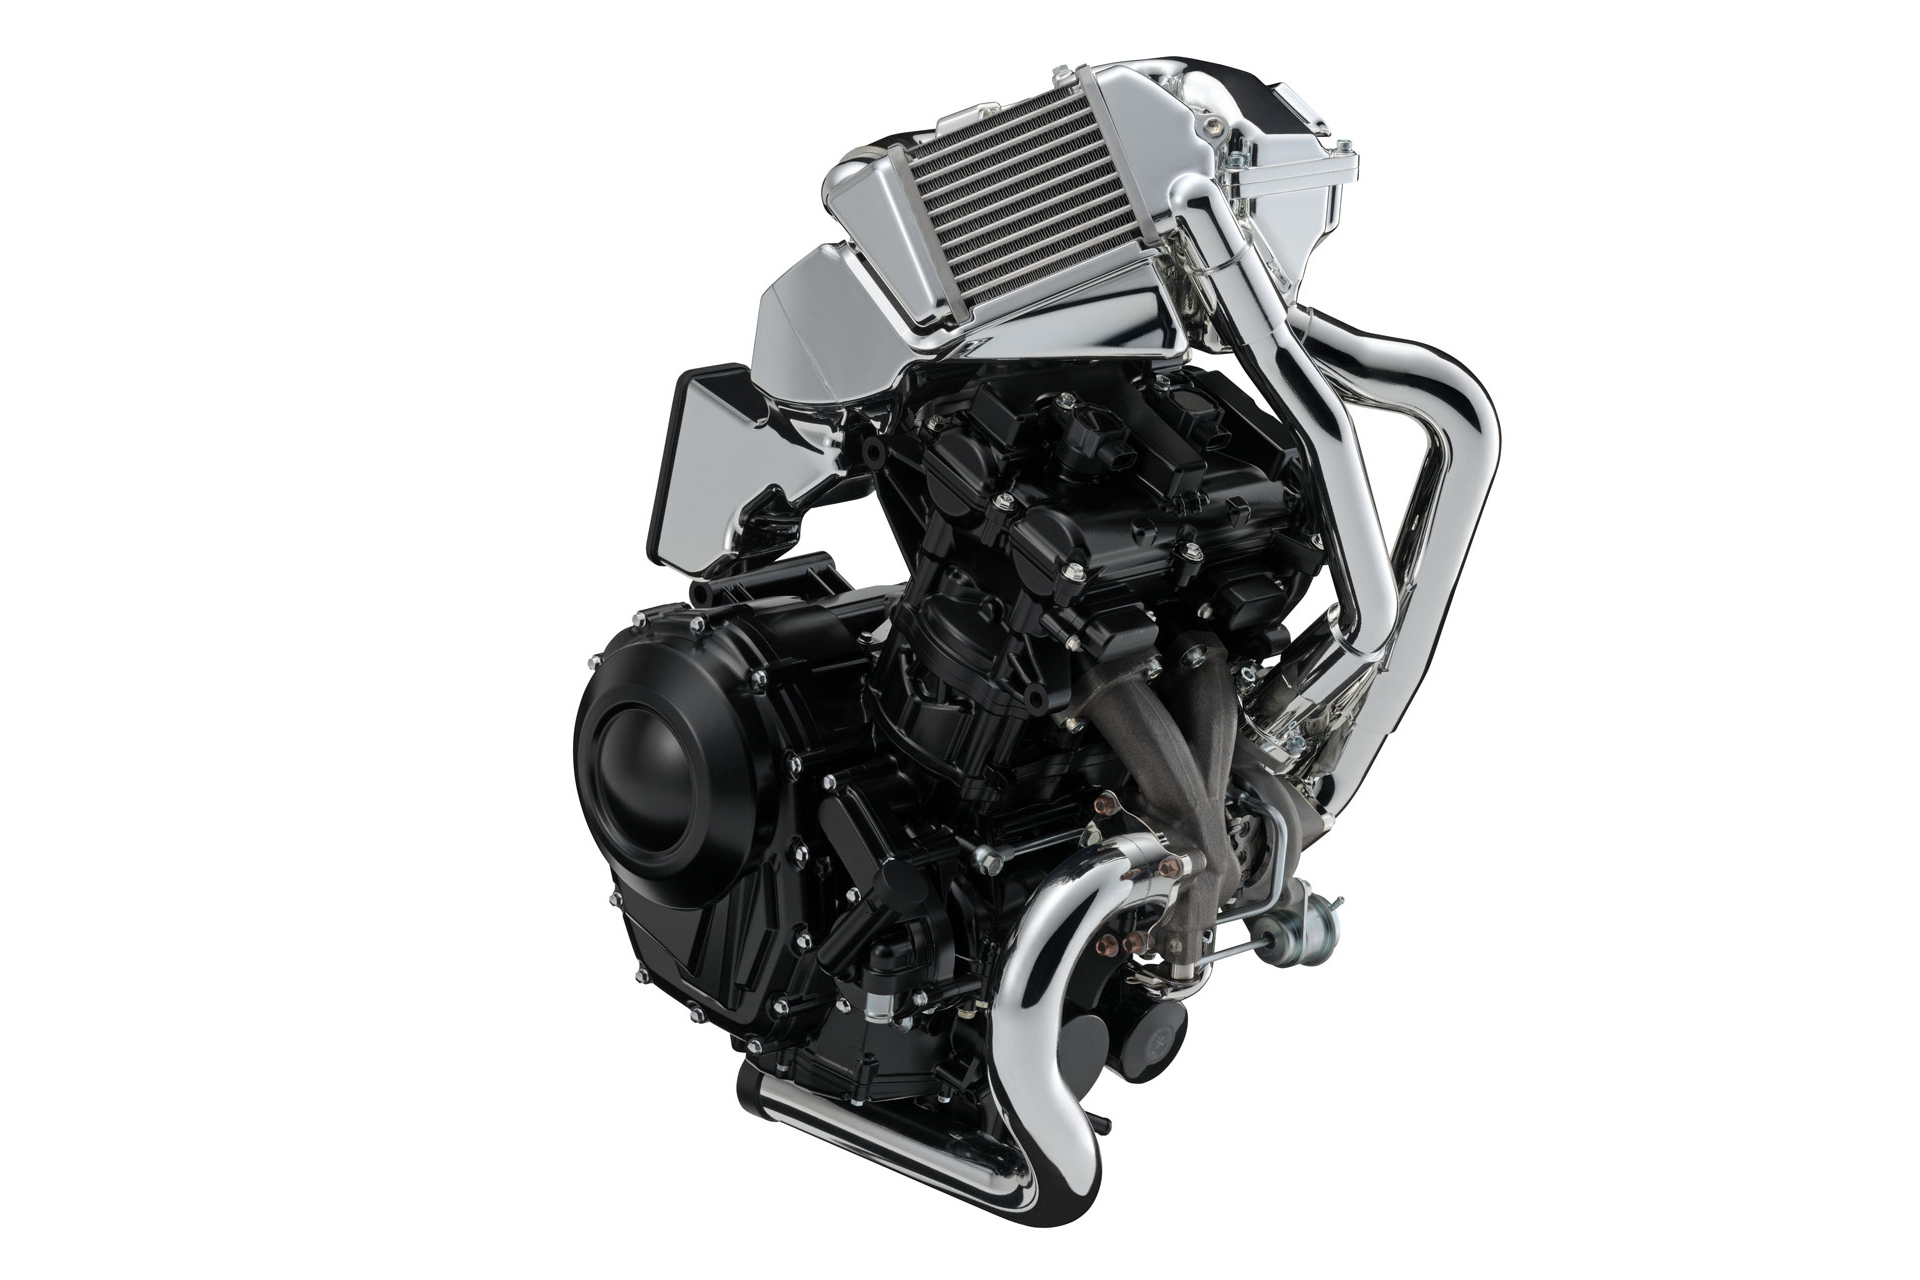 Suzuki displays turbo engine at Tokyo Motor Show